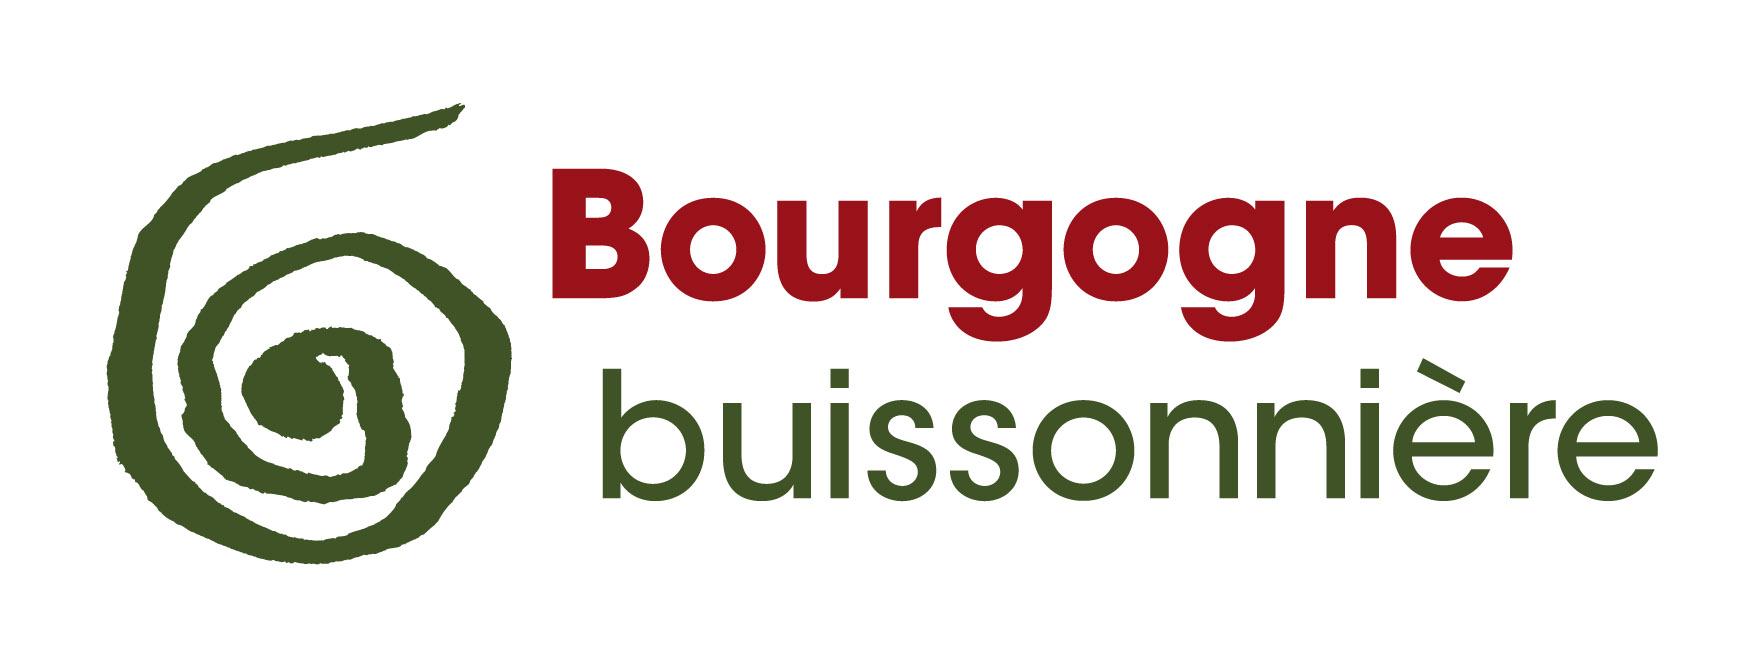 Burgundy backroads